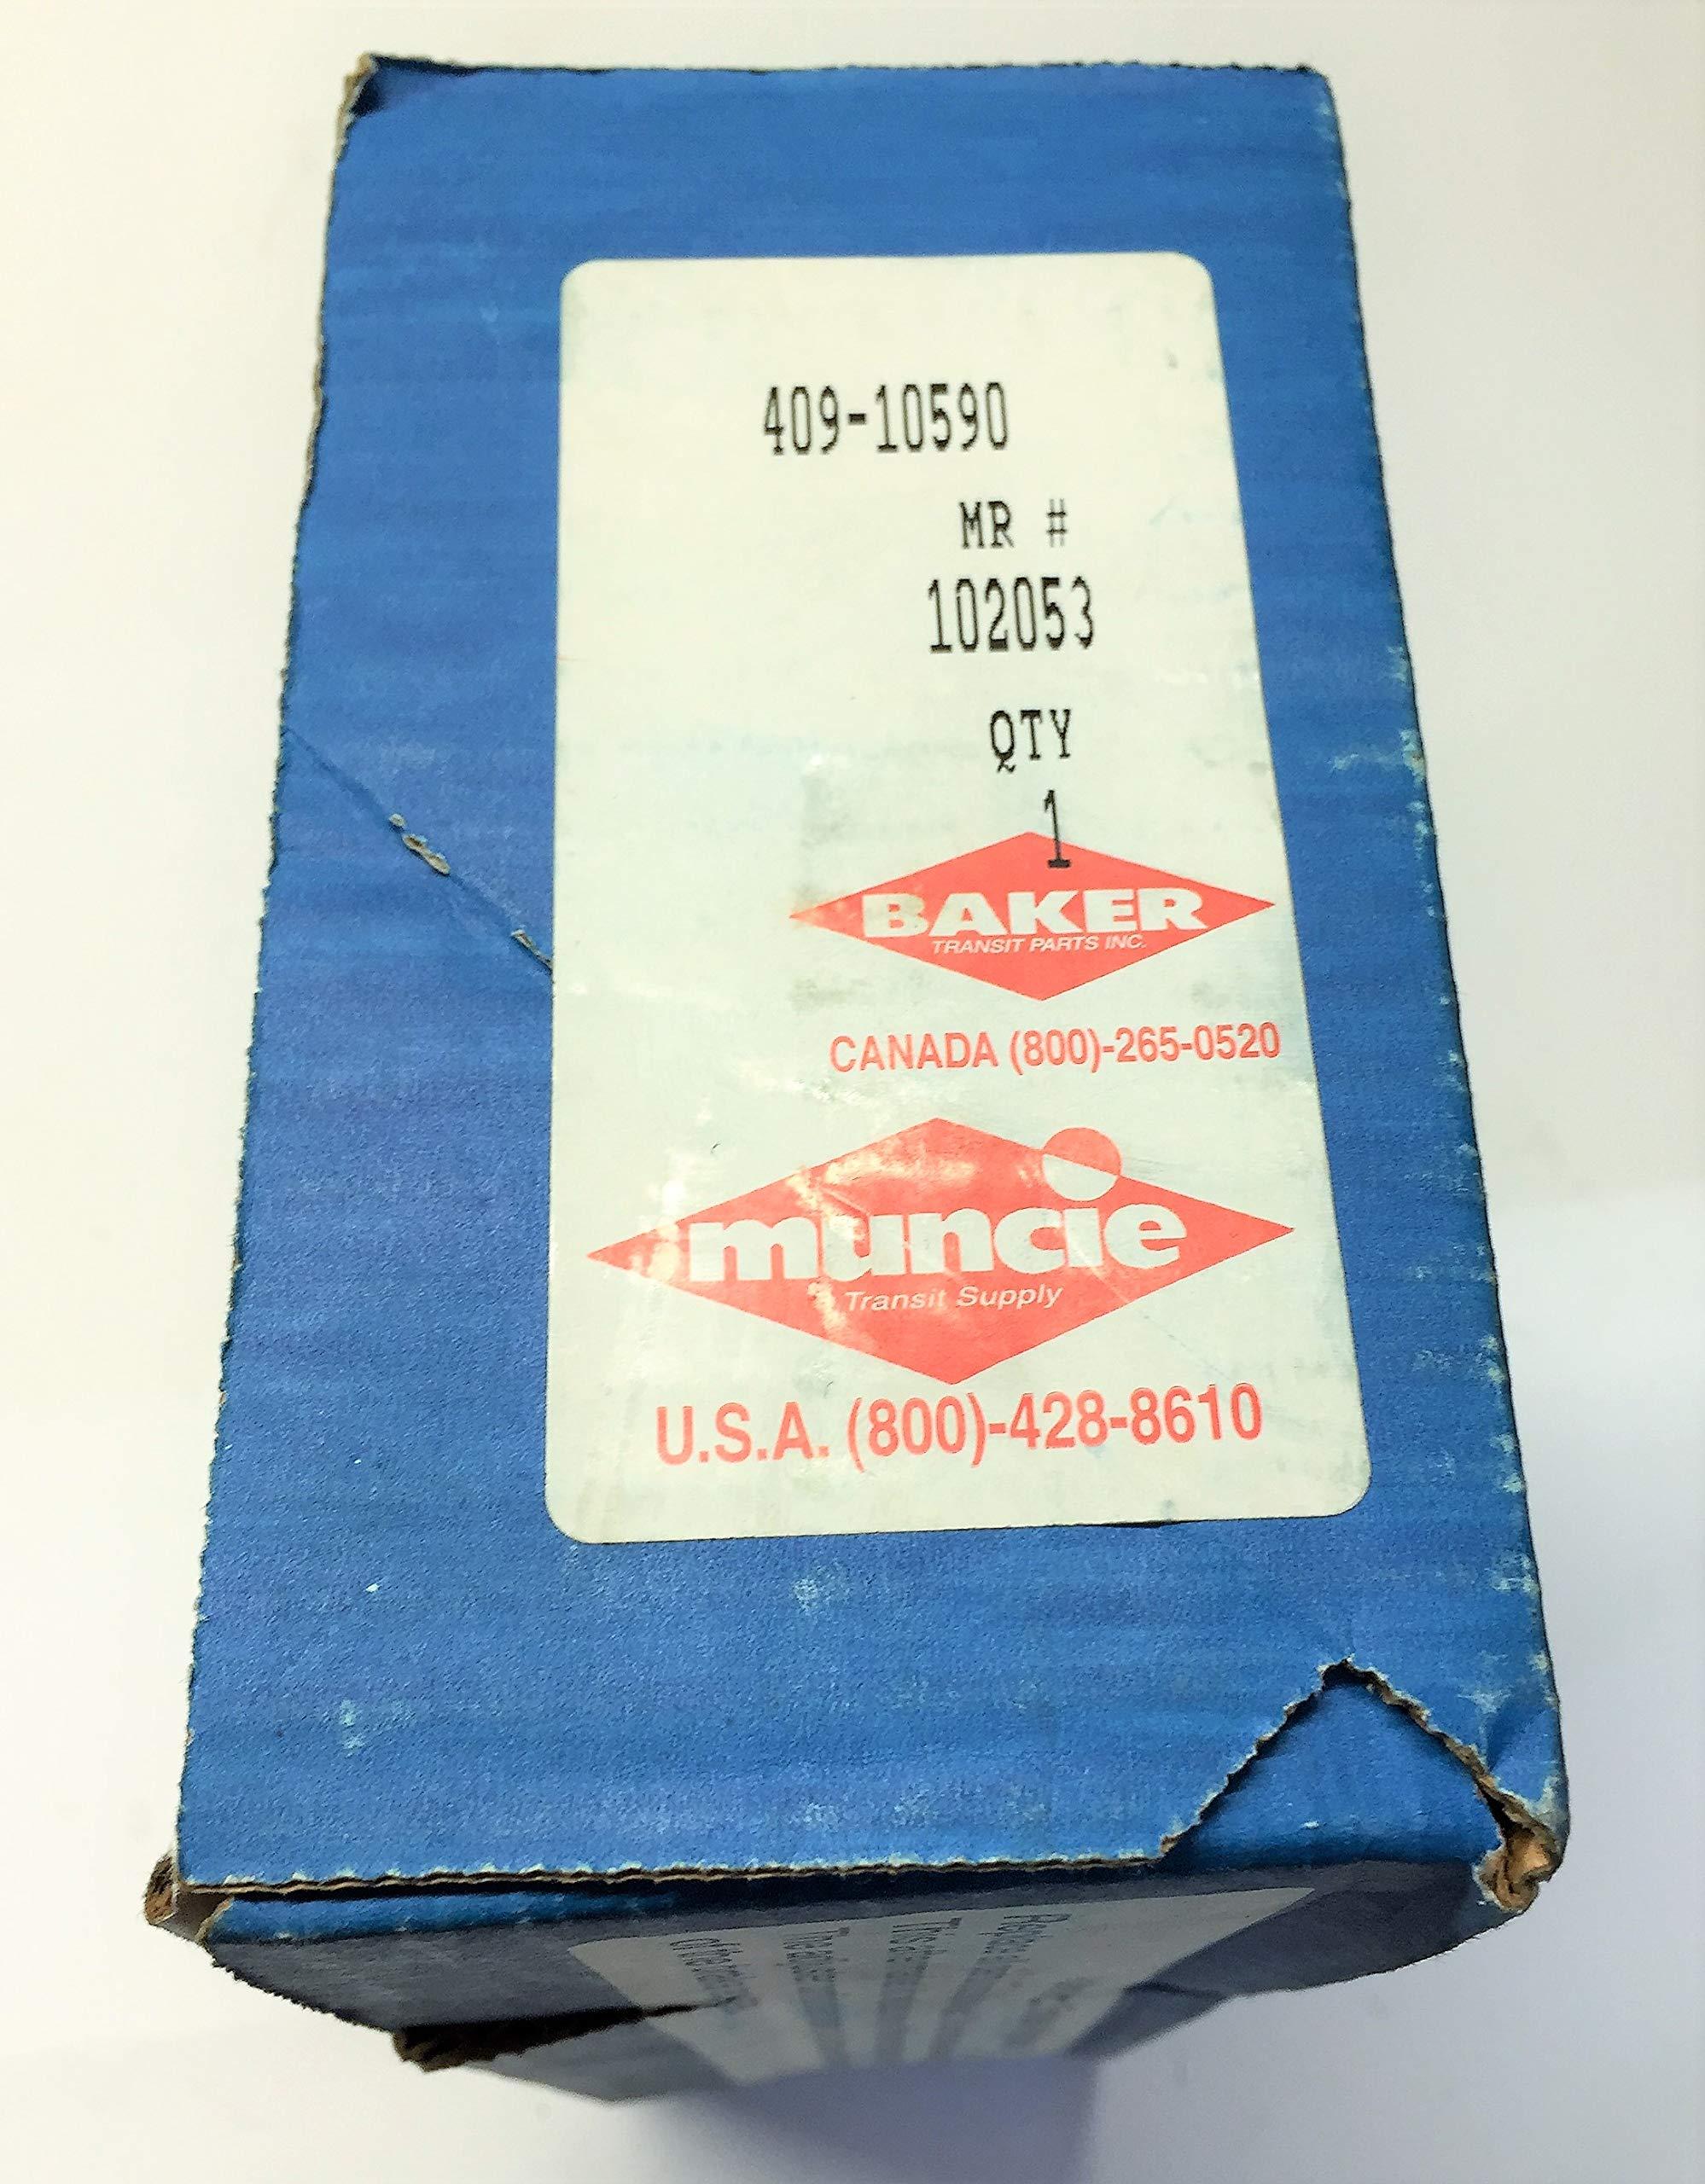 Haldex Automatic Brake Adjuster 409-10590 by Haldex (Image #7)